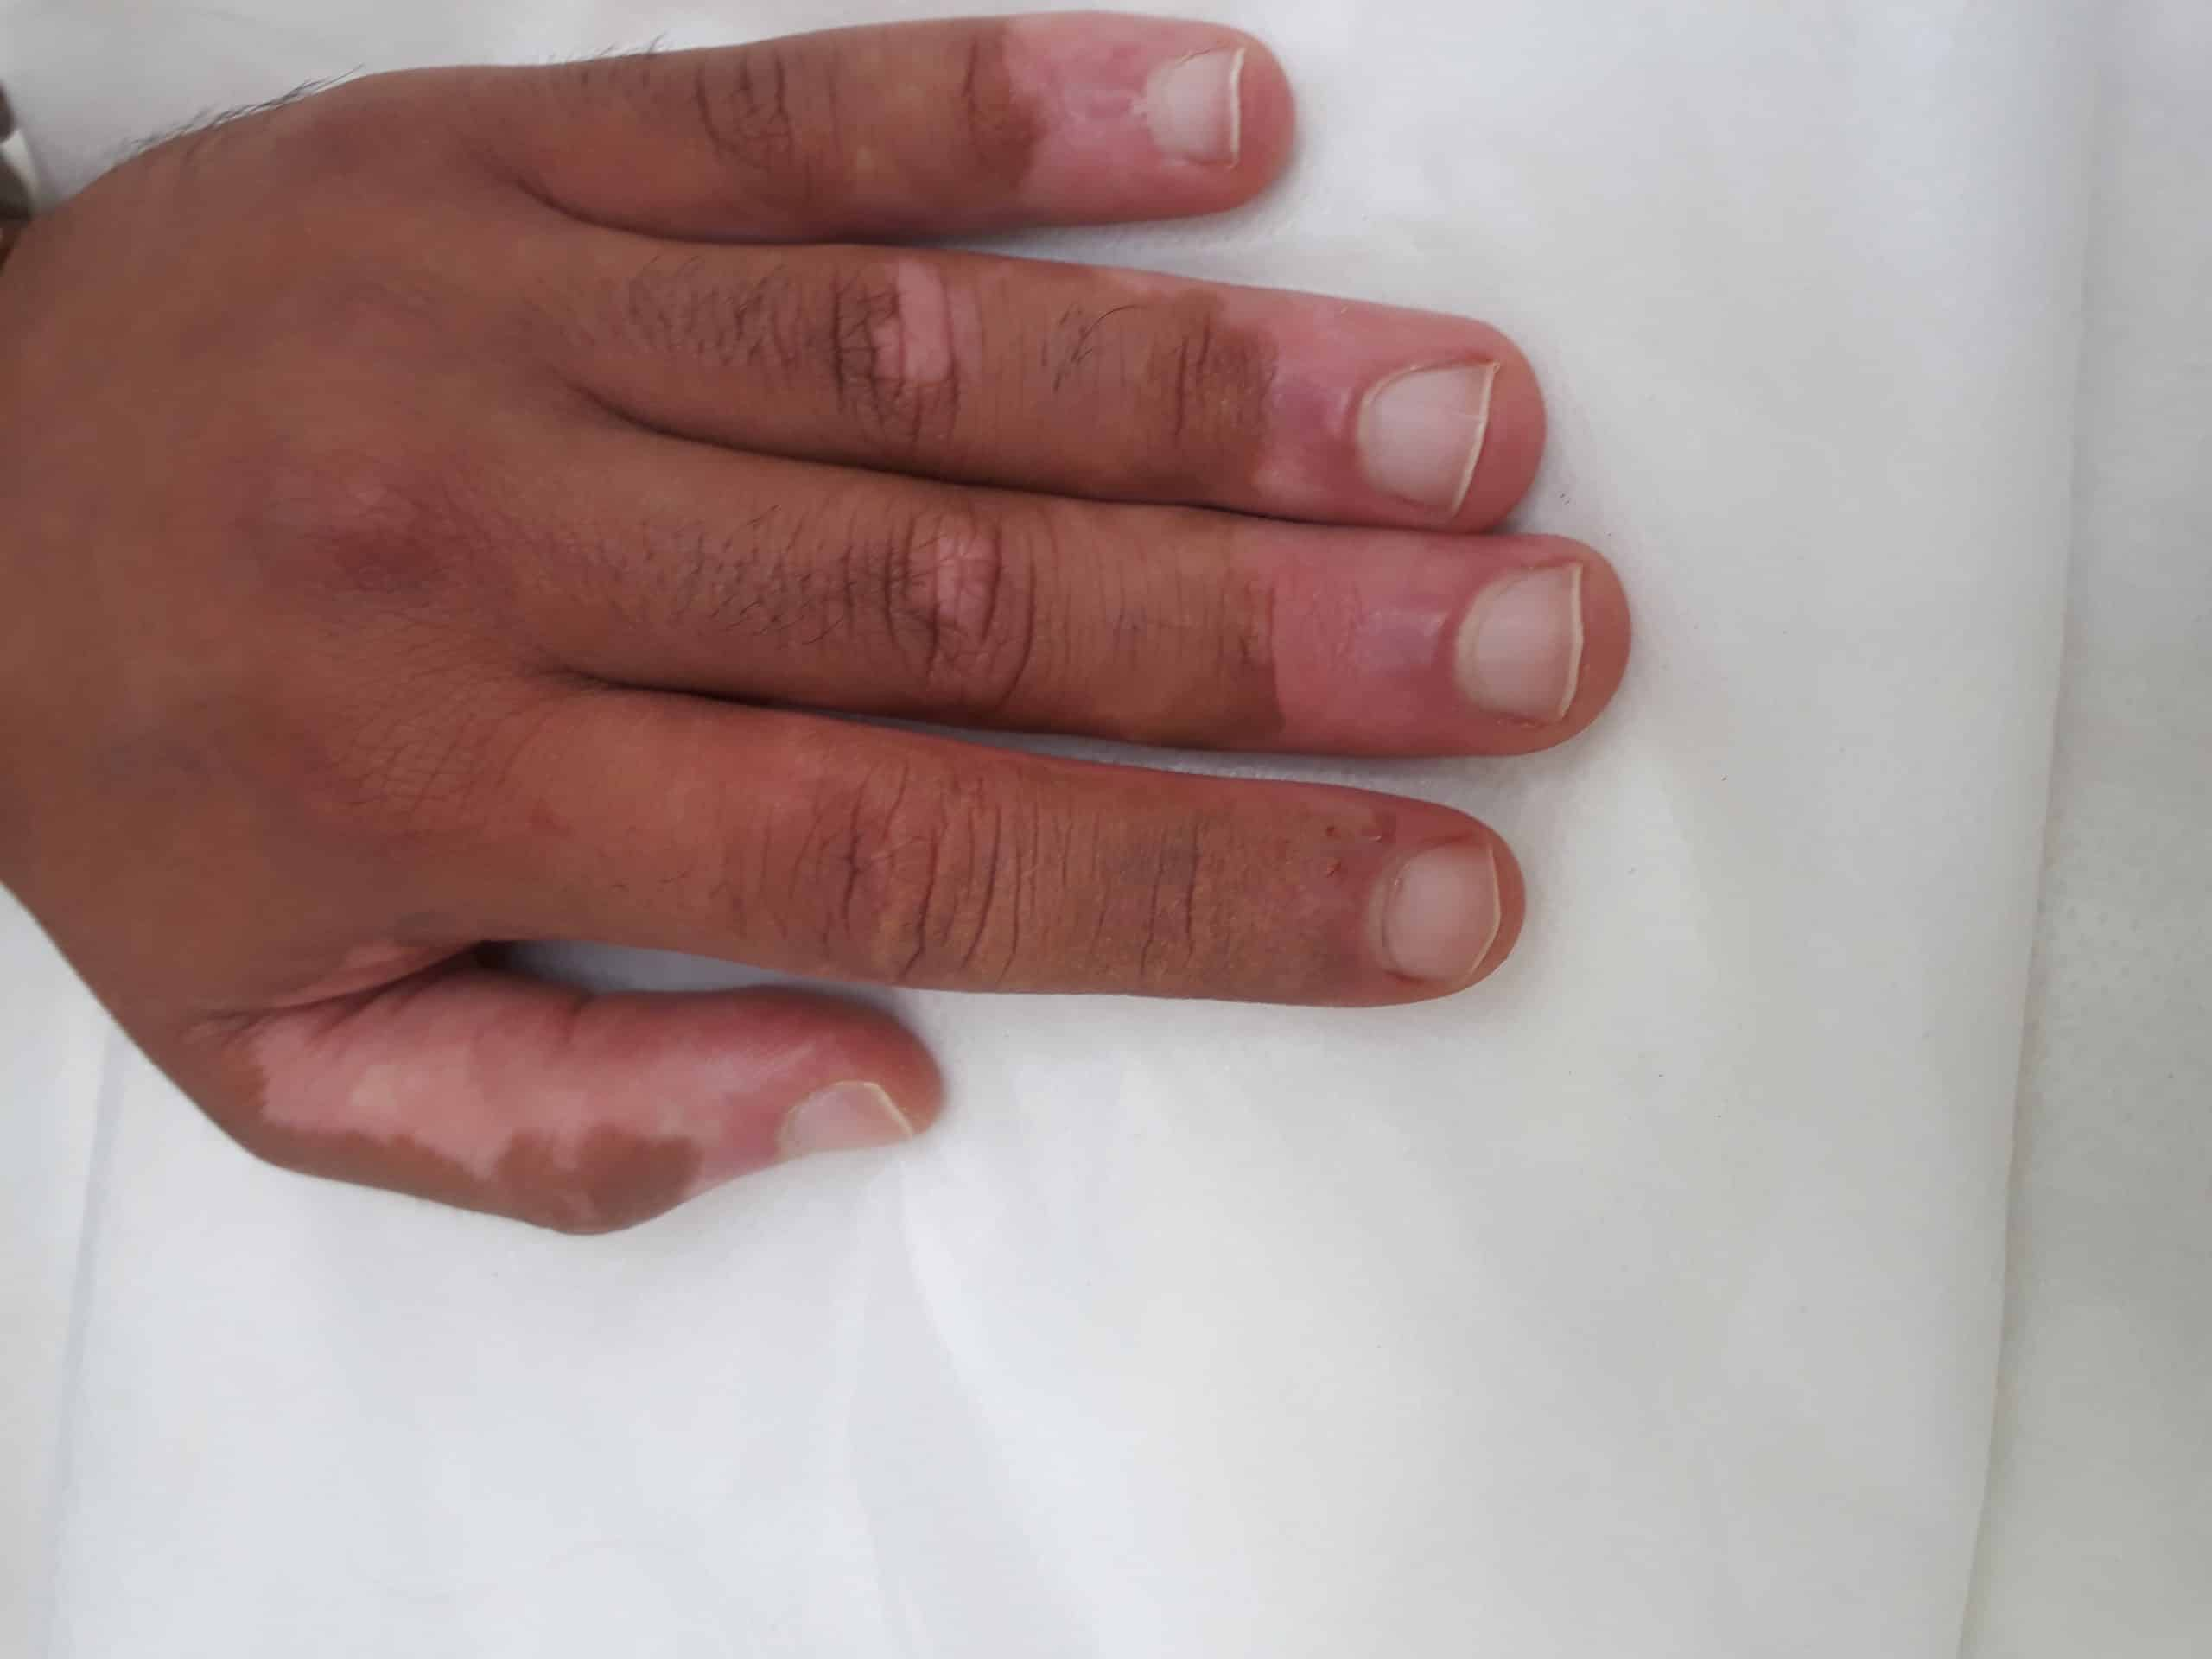 טשטוש ויטיליגו באצבע